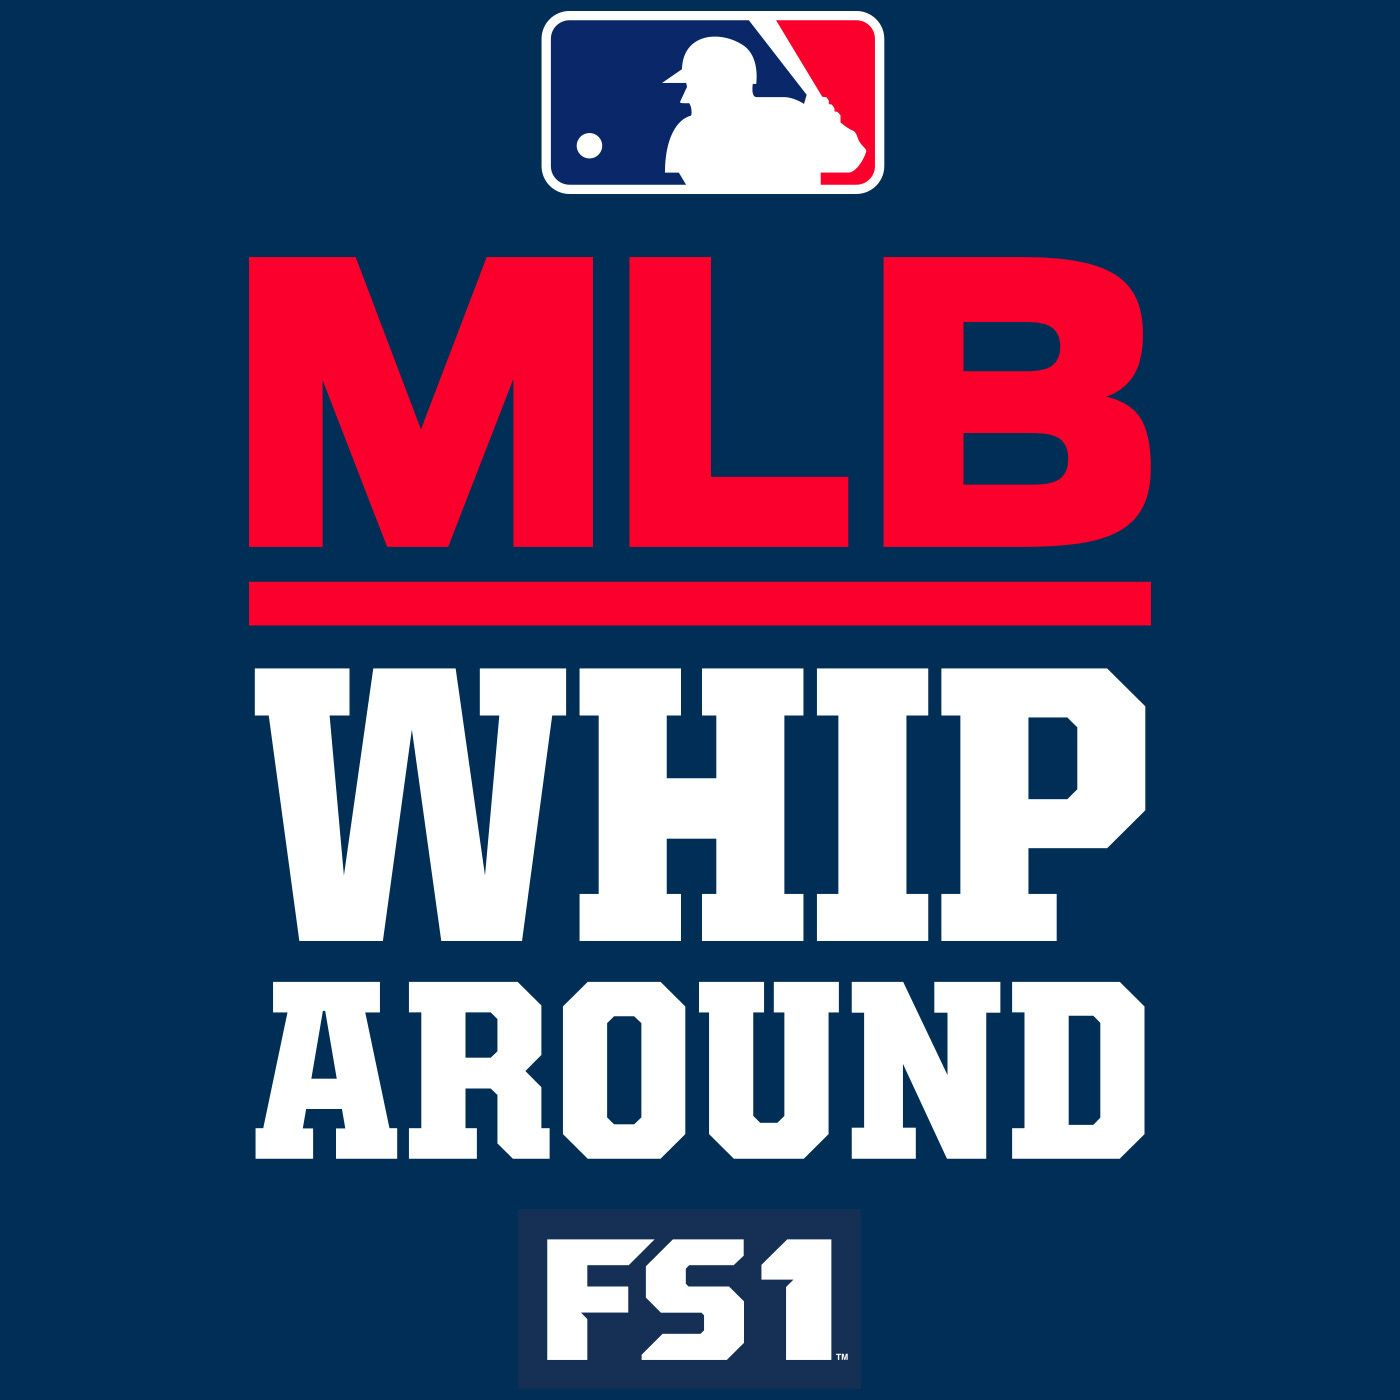 9/24 Athletics, Red Sox, Cardinals, Brewers, Rockies